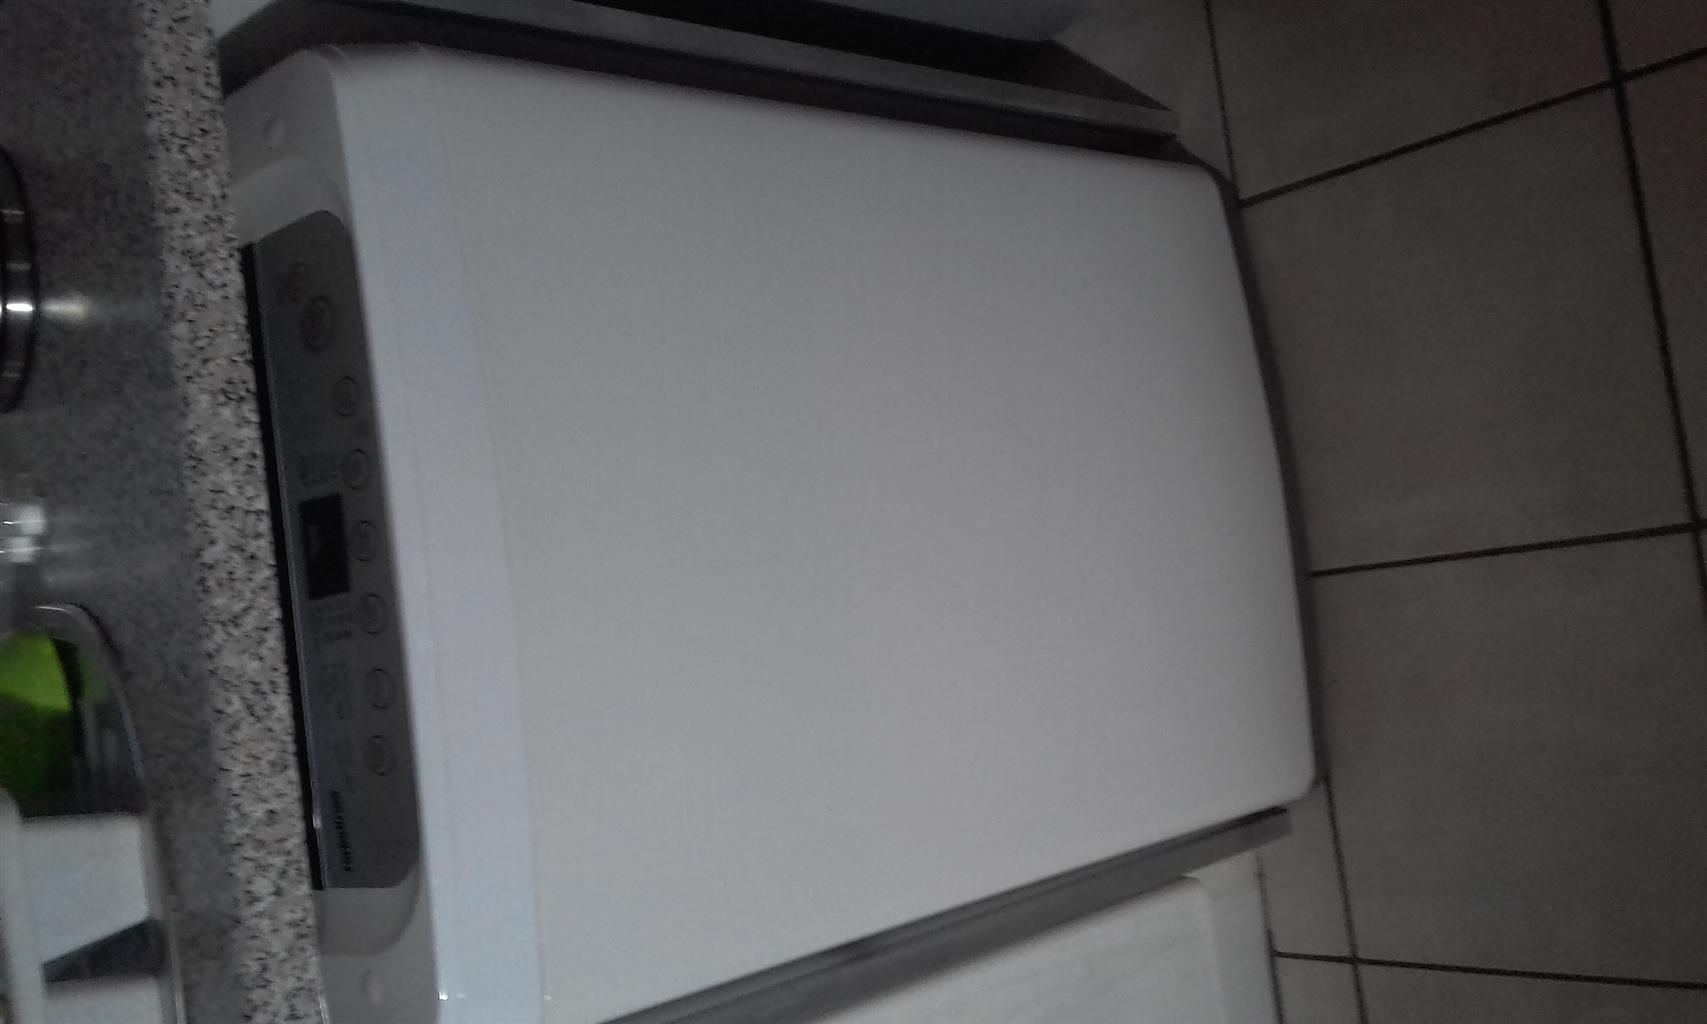 LG fuzzy logic washing machine 8.2kgs for R2500